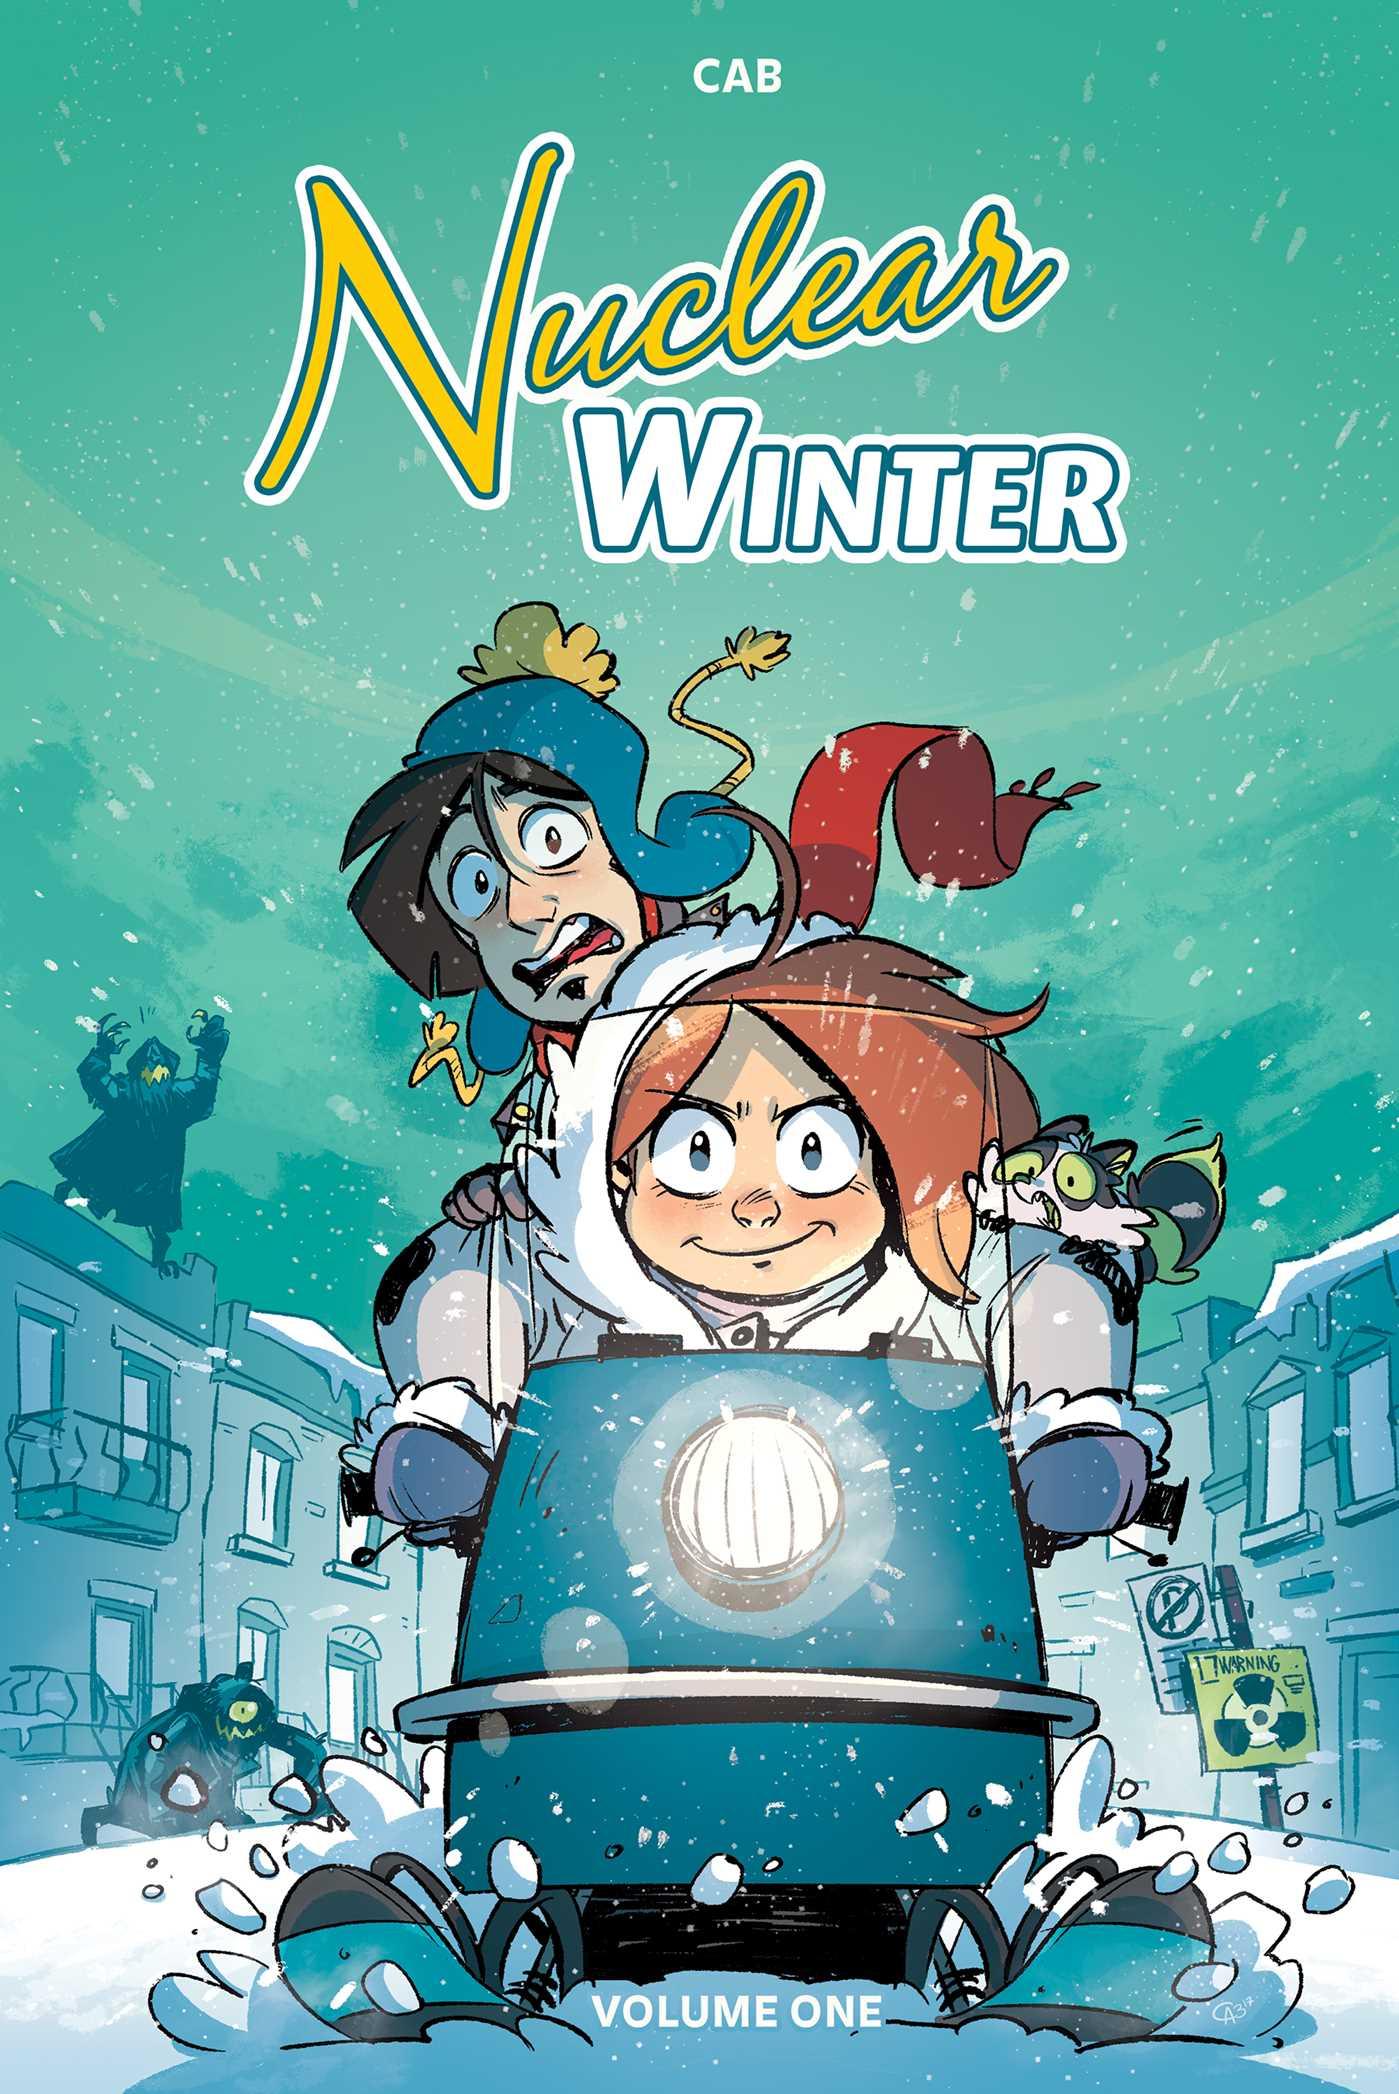 Nuclear winter vol 1 9781684151639 hr